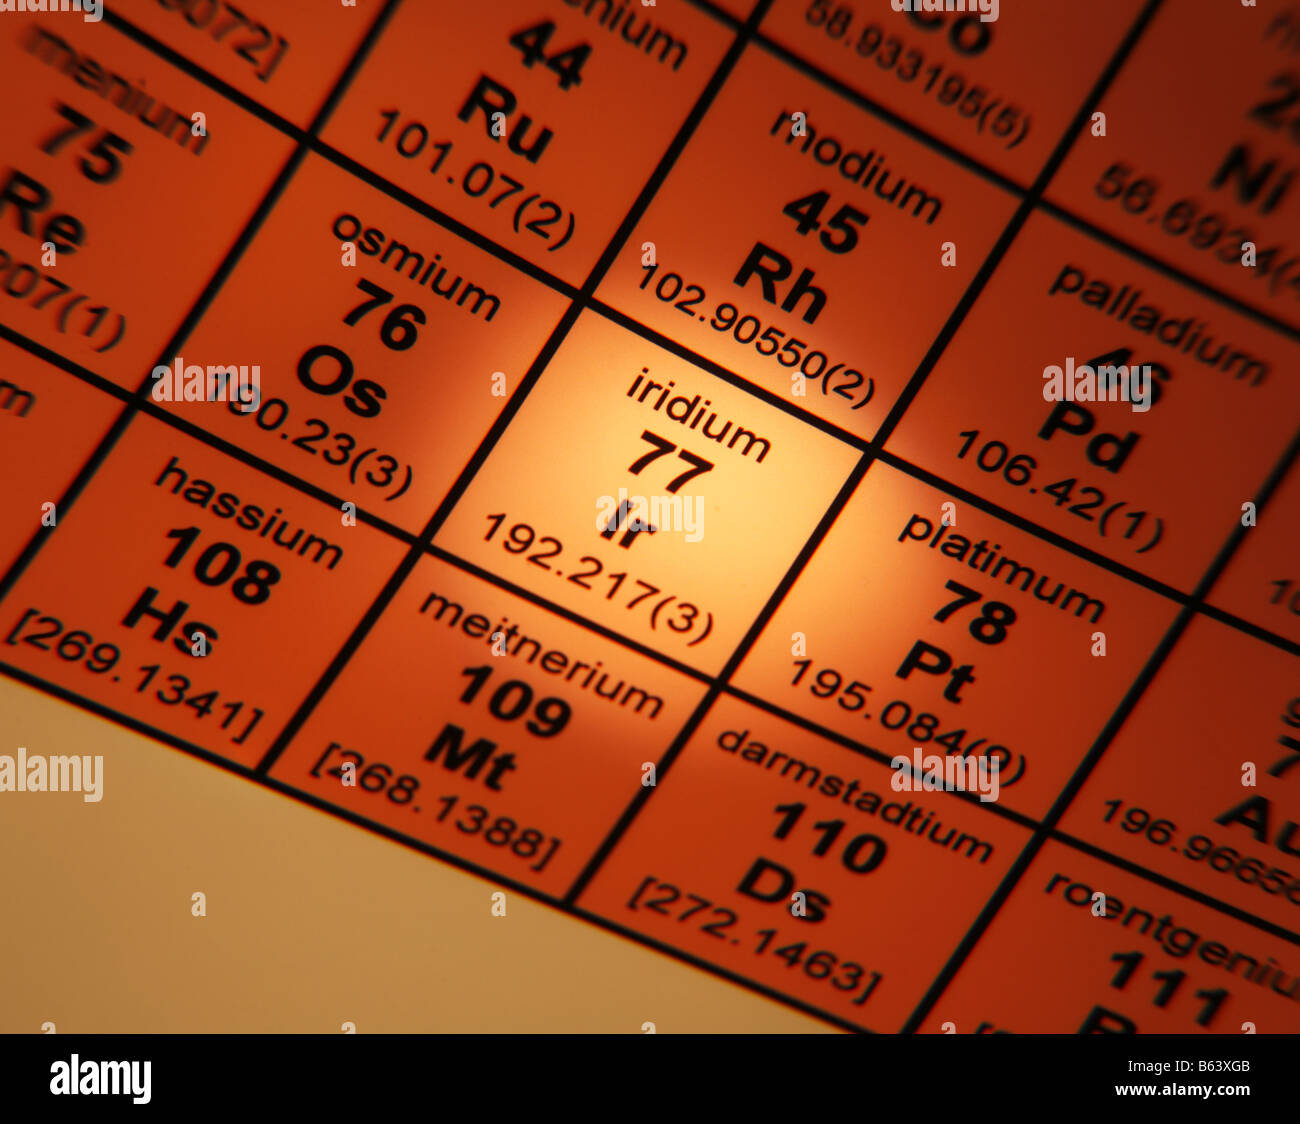 Periodensystem der Elemente iridium Stockbild